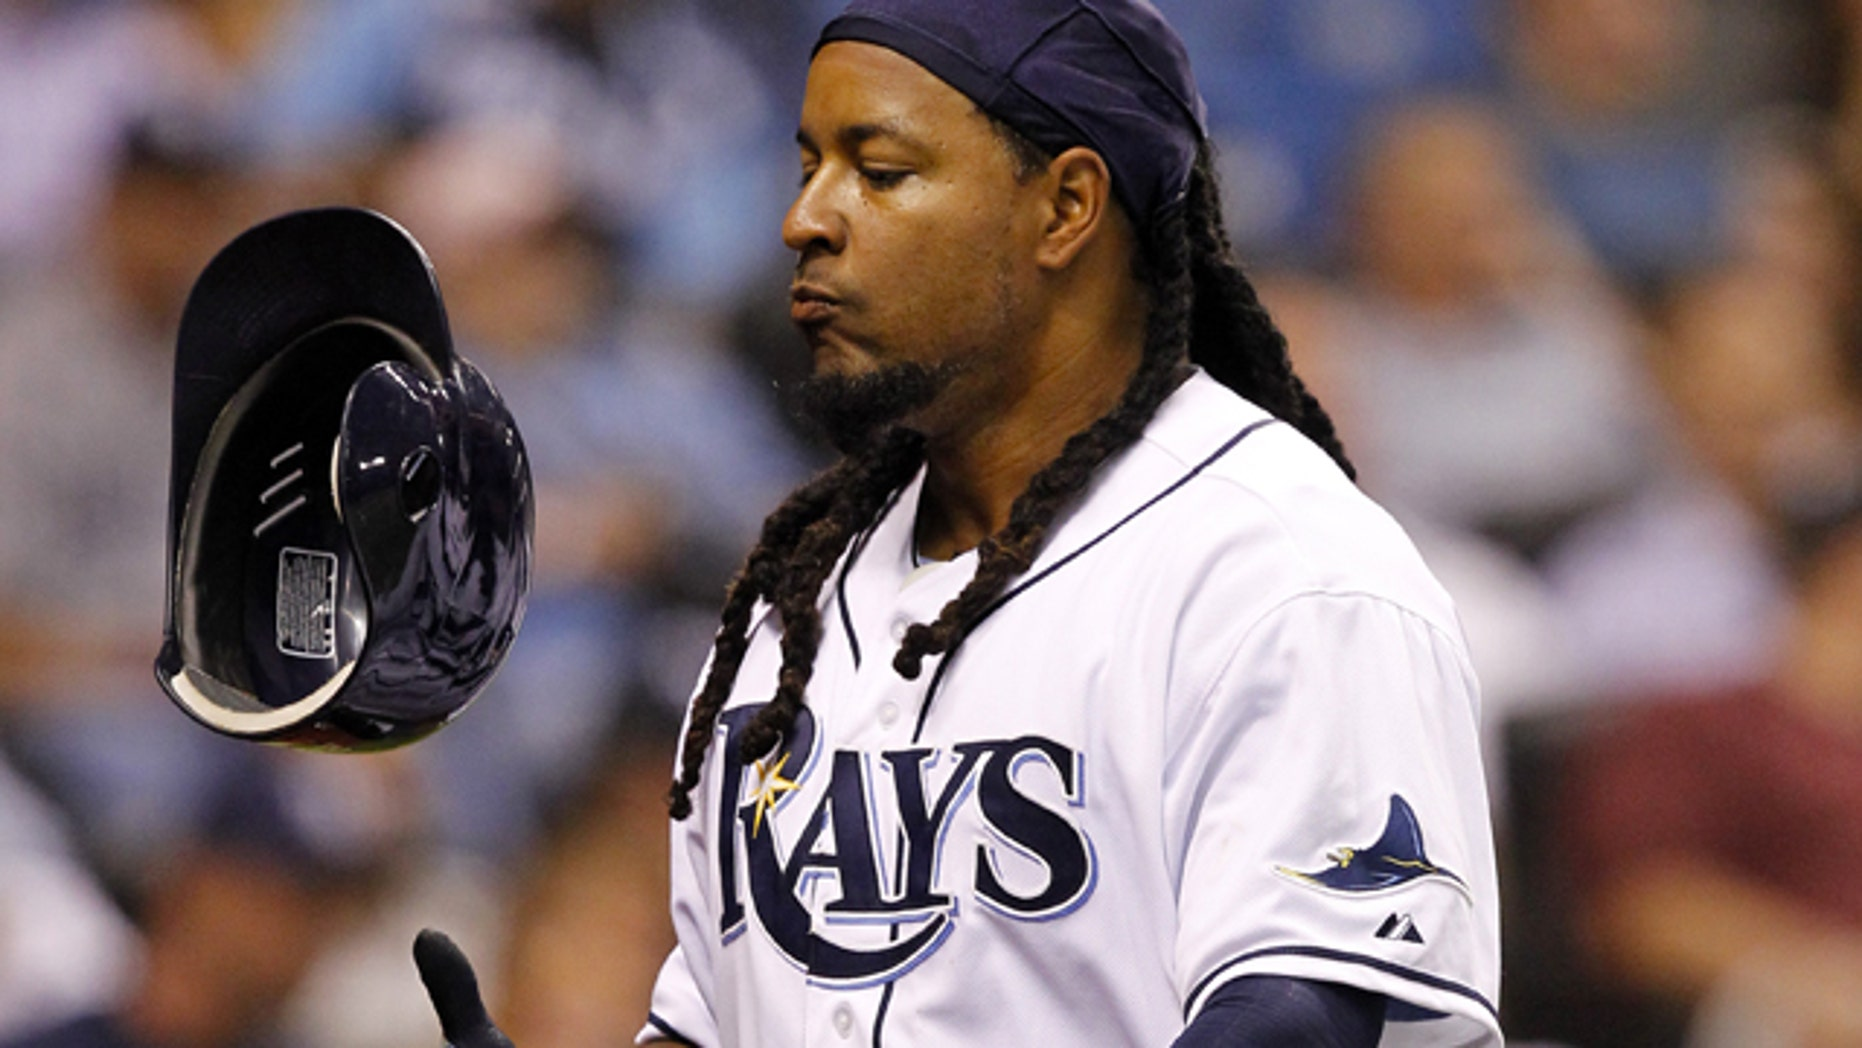 Tampa Bay Rays' Manny Ramirez is retiring rather than submit to an MLB drug treatment program.